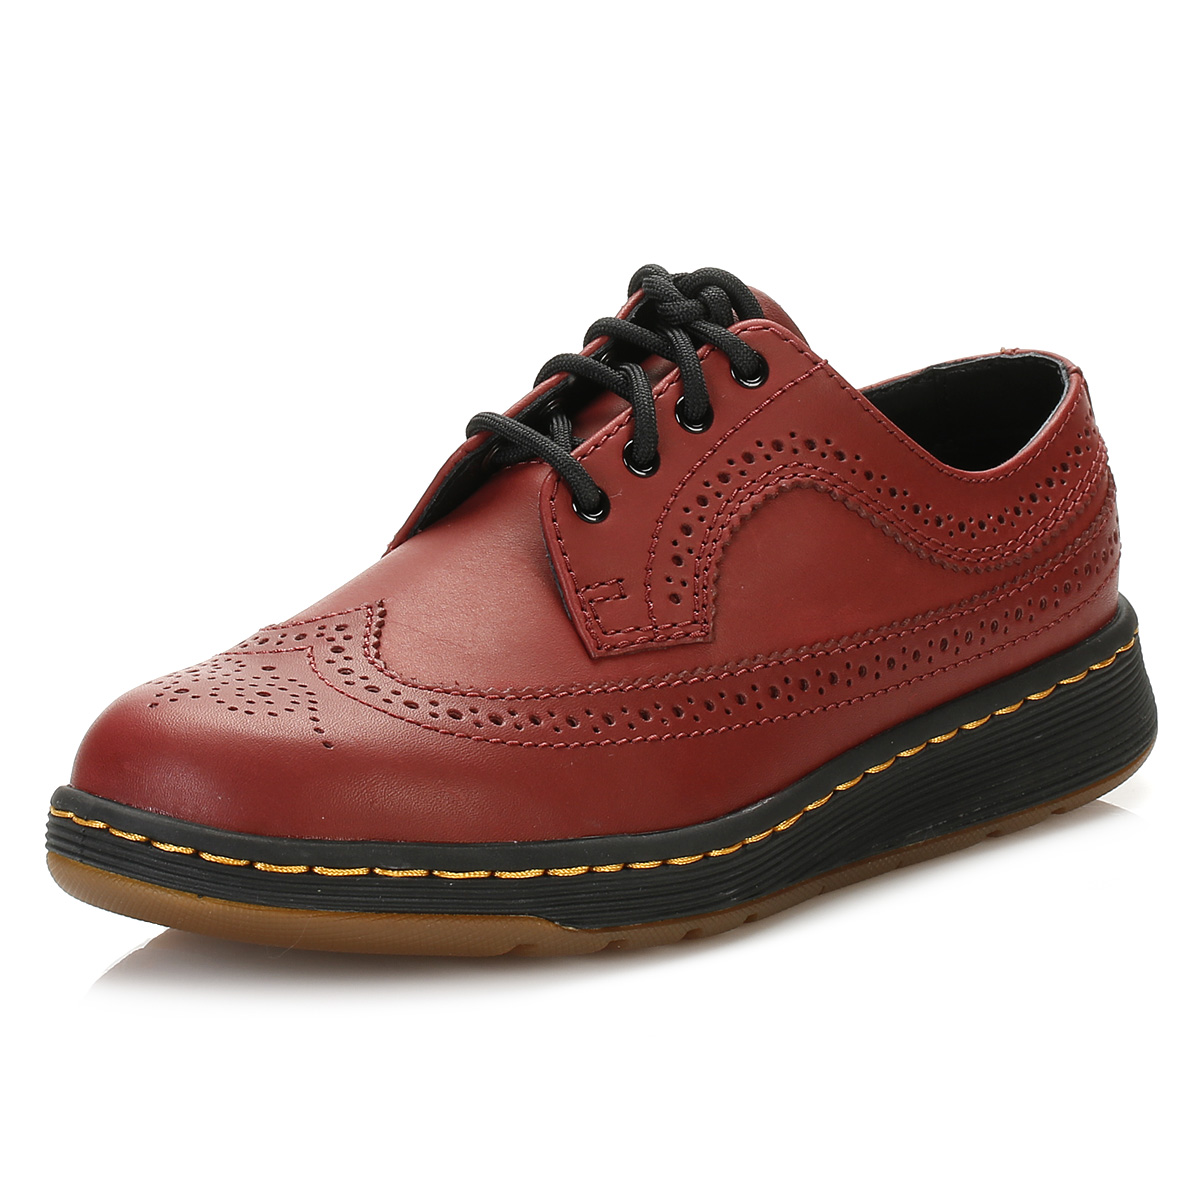 Dr Comfort Shoes Uk